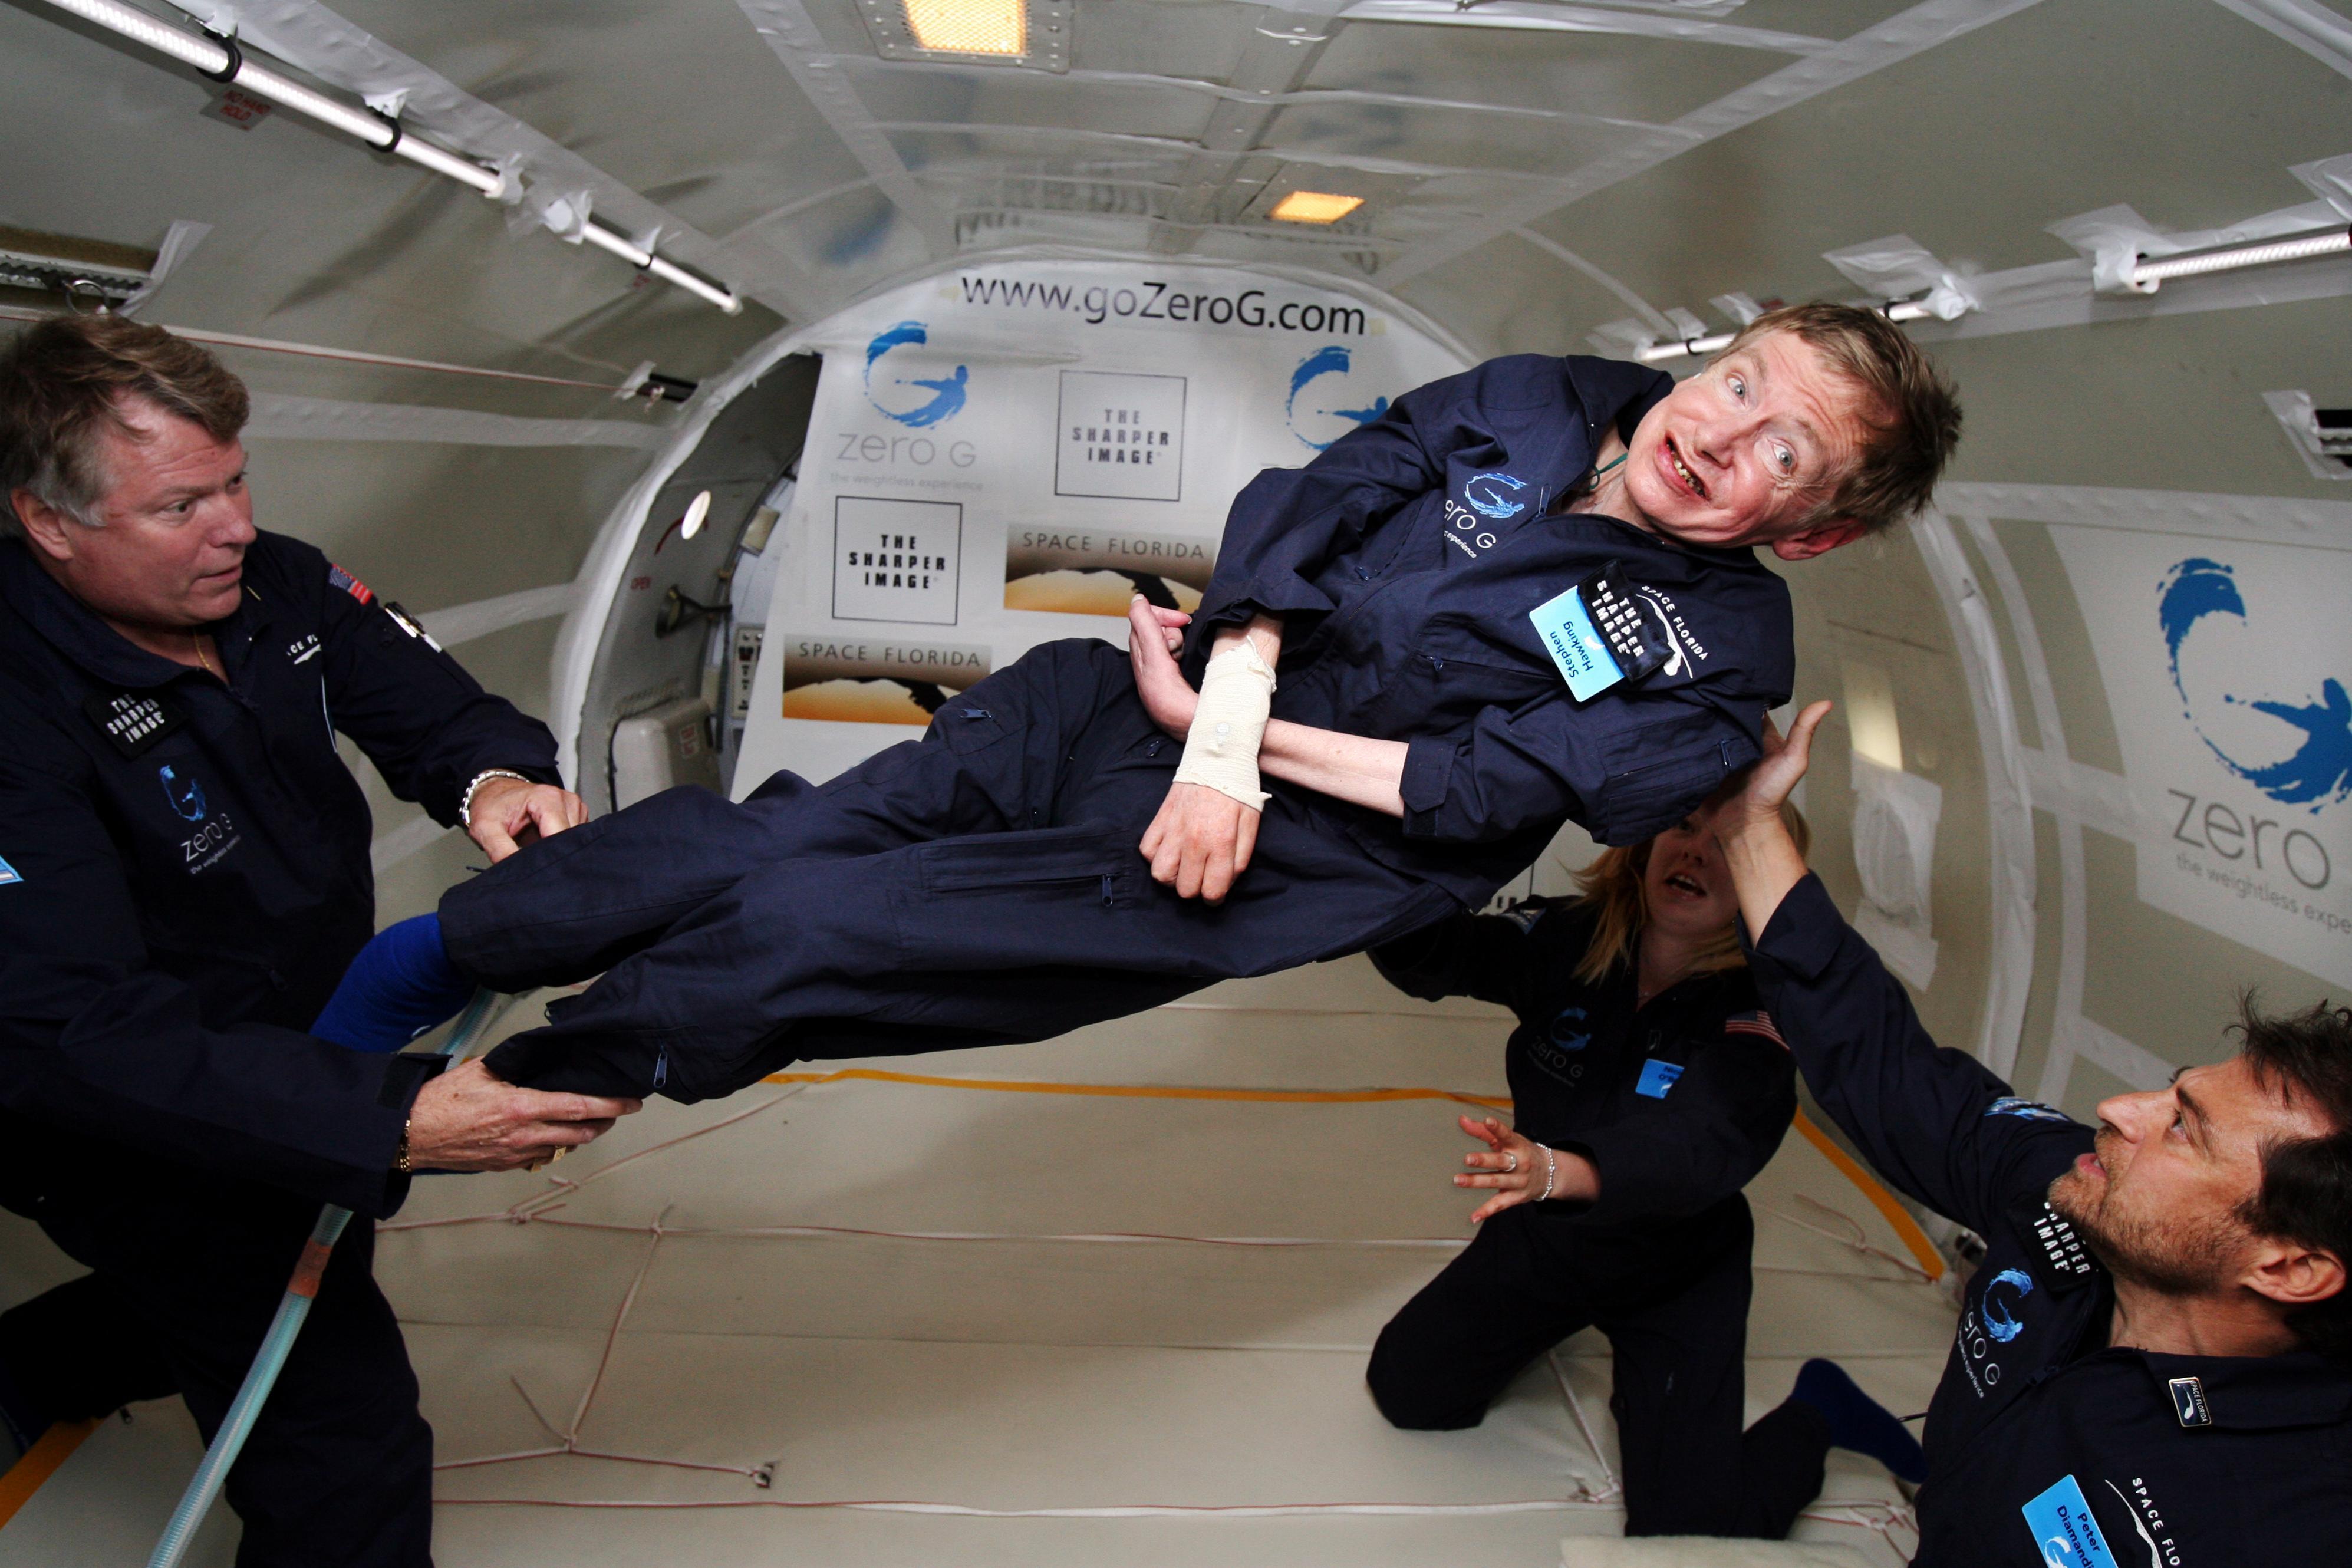 Stephen Hawking – ved en annen anledning. Foto: Jim Campbell/Aero-News Network